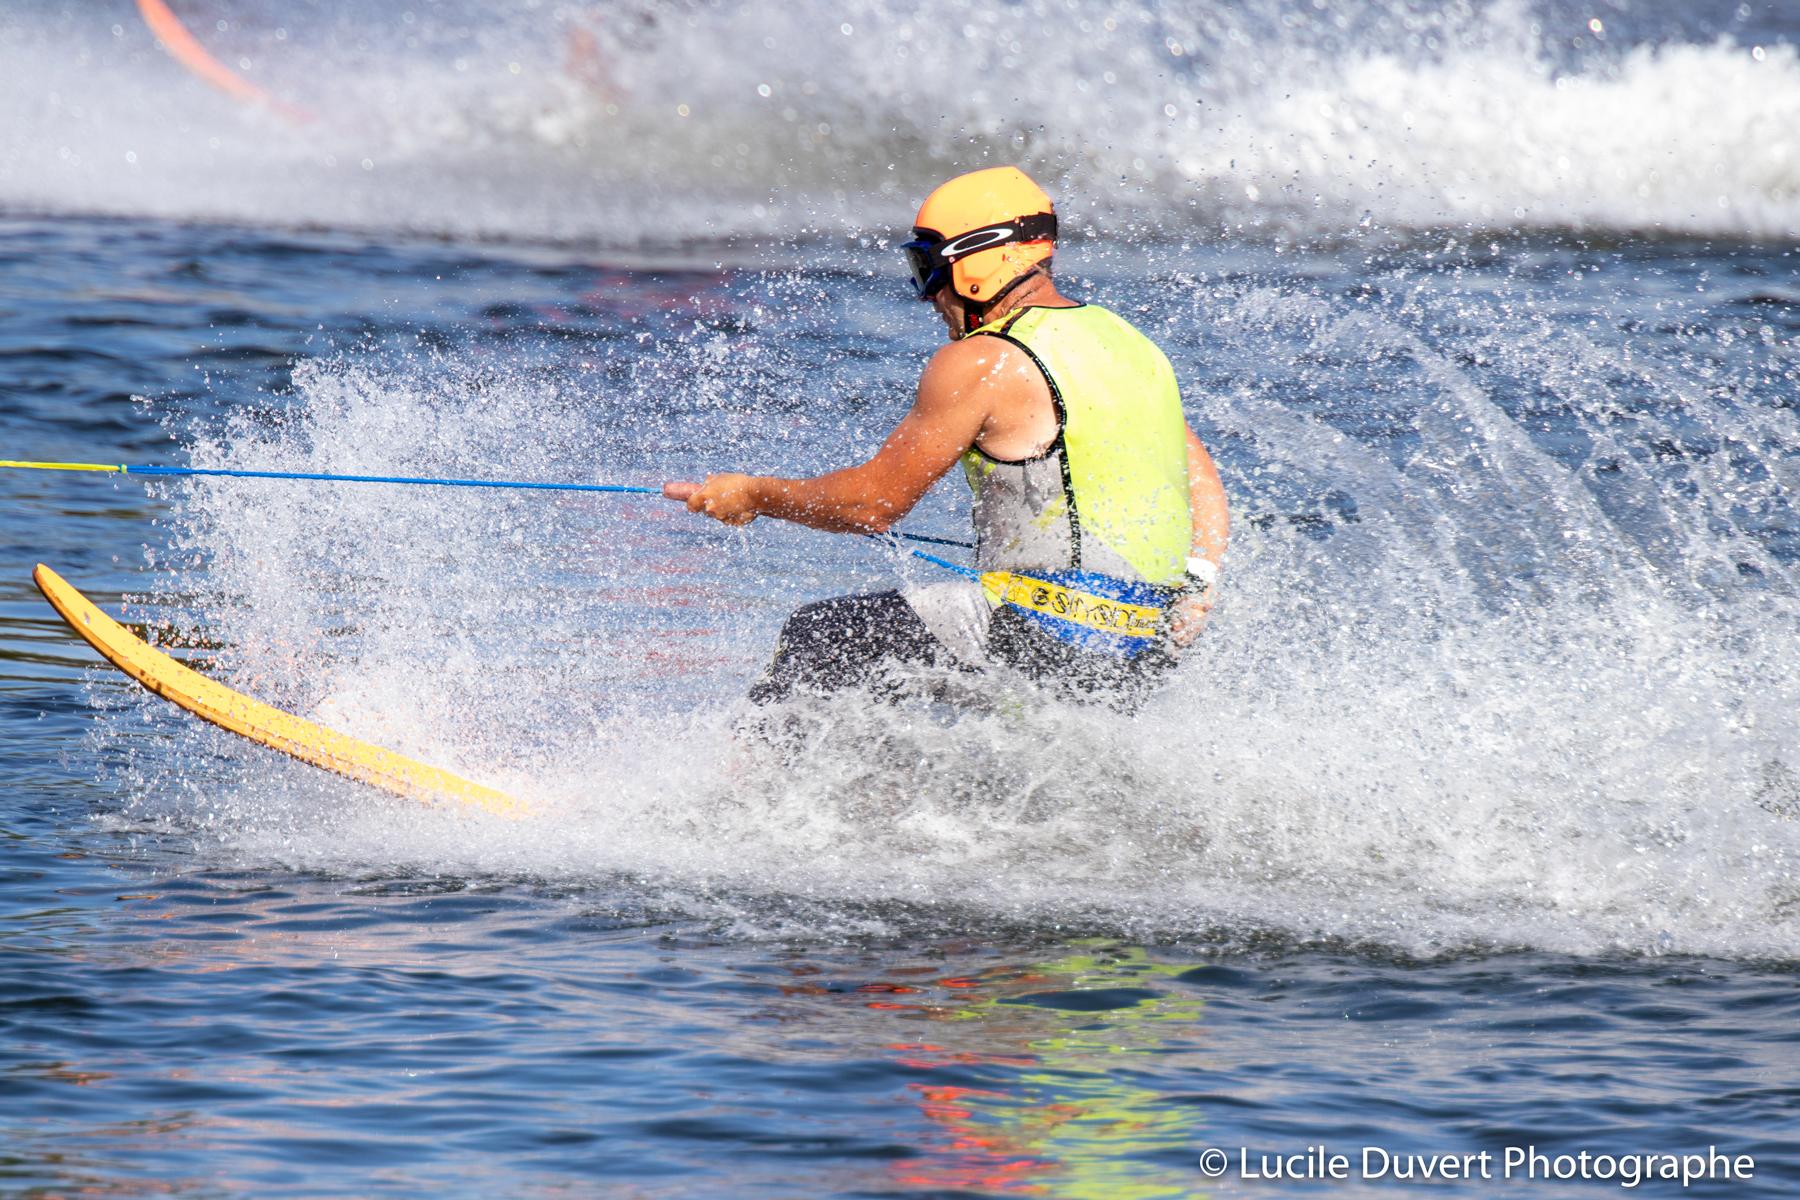 photographe-professionnelle-ski-nautique-water